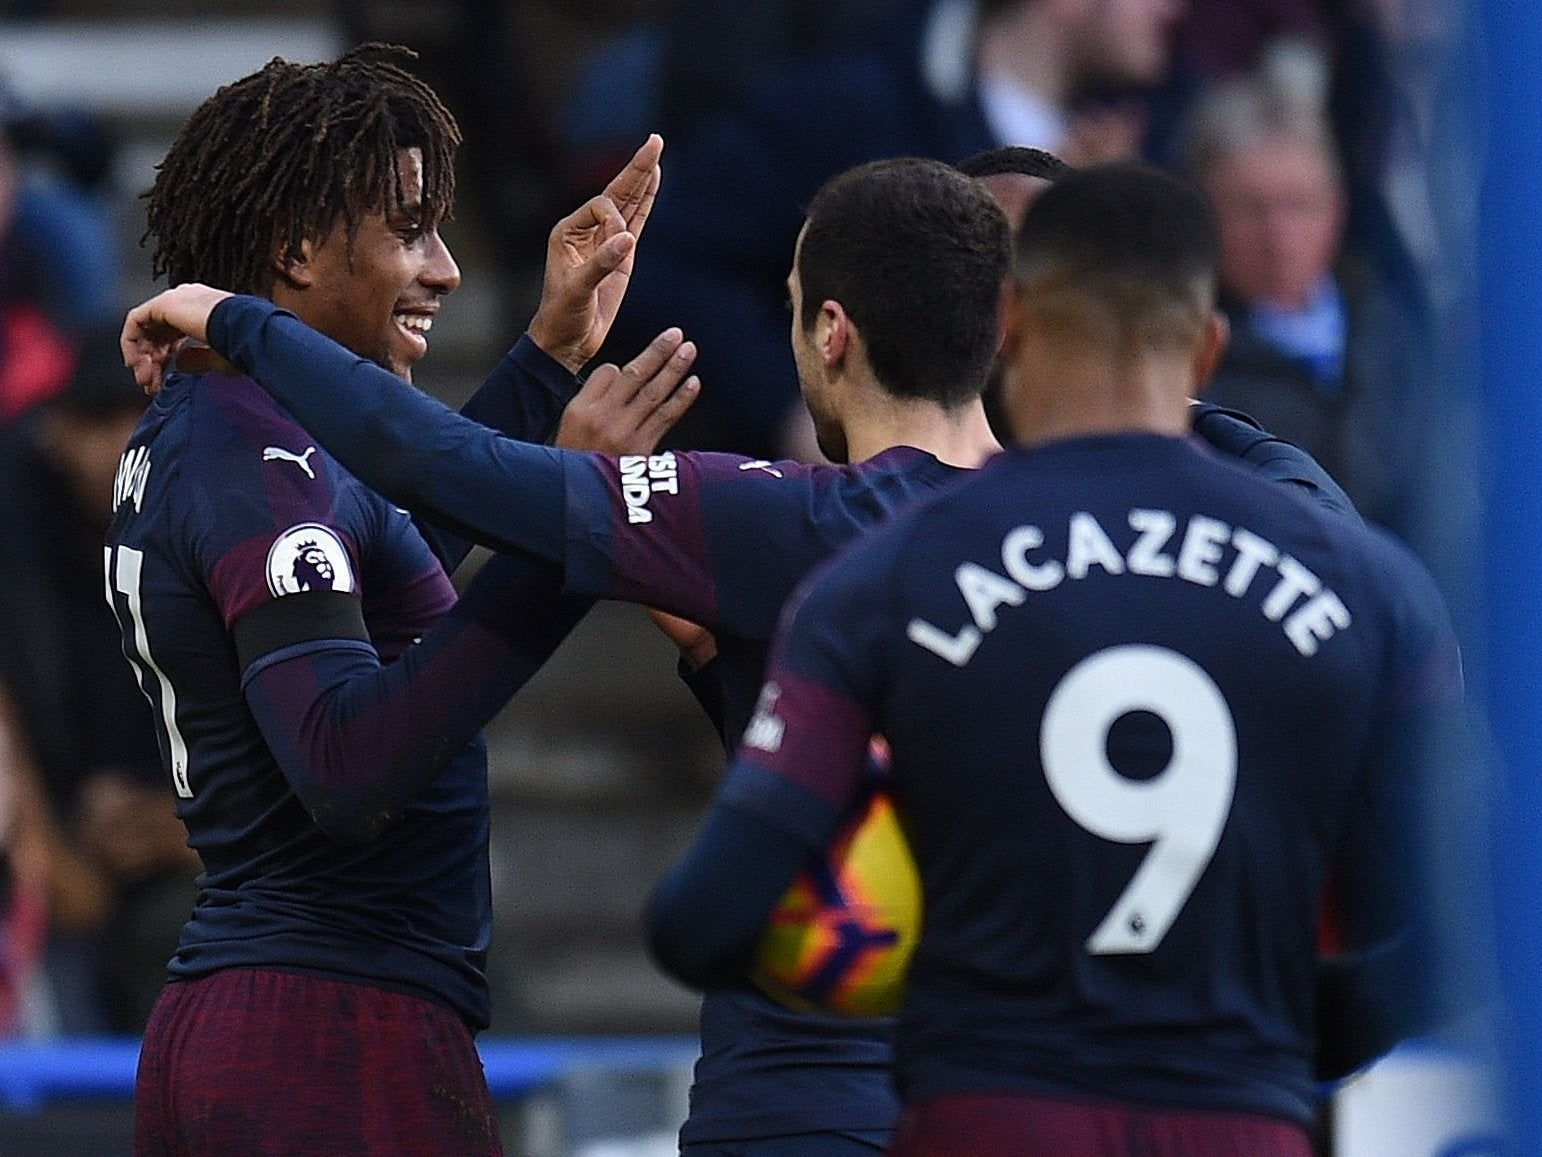 Huddersfield Vs Arsenal: Huddersfield Vs Arsenal LIVE: Stream, Score, Goals, Team